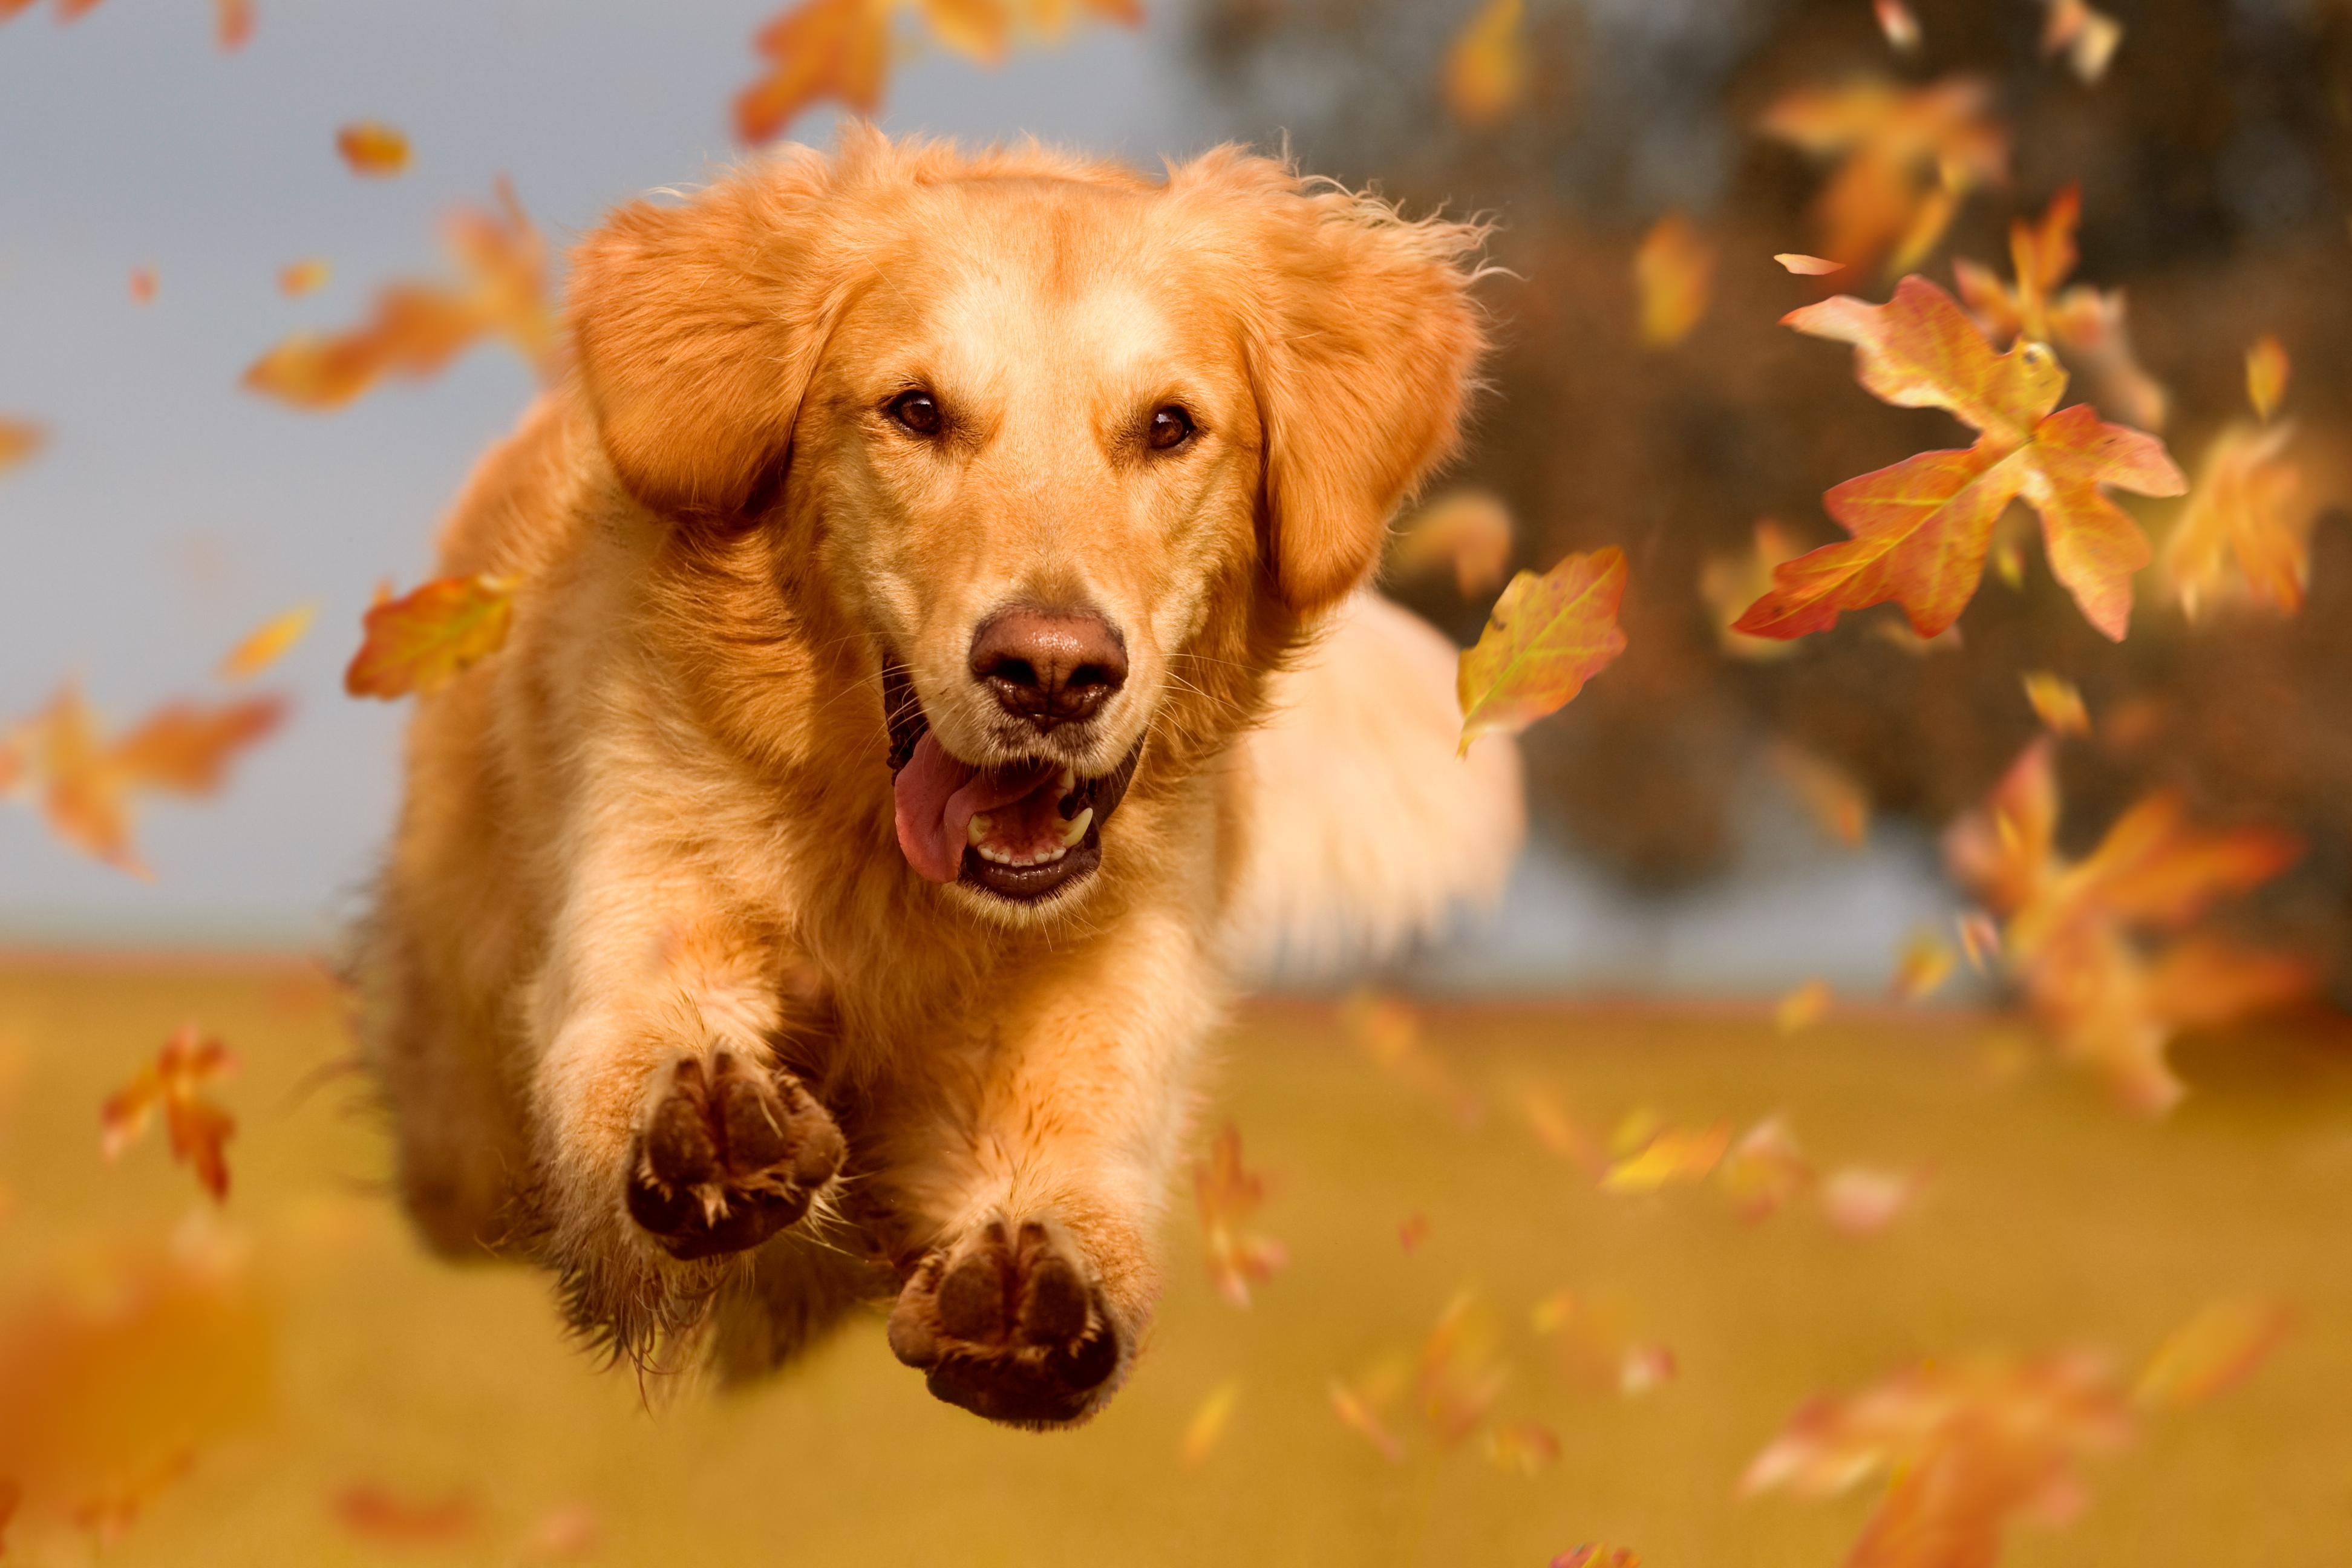 dog running through autumn leaves